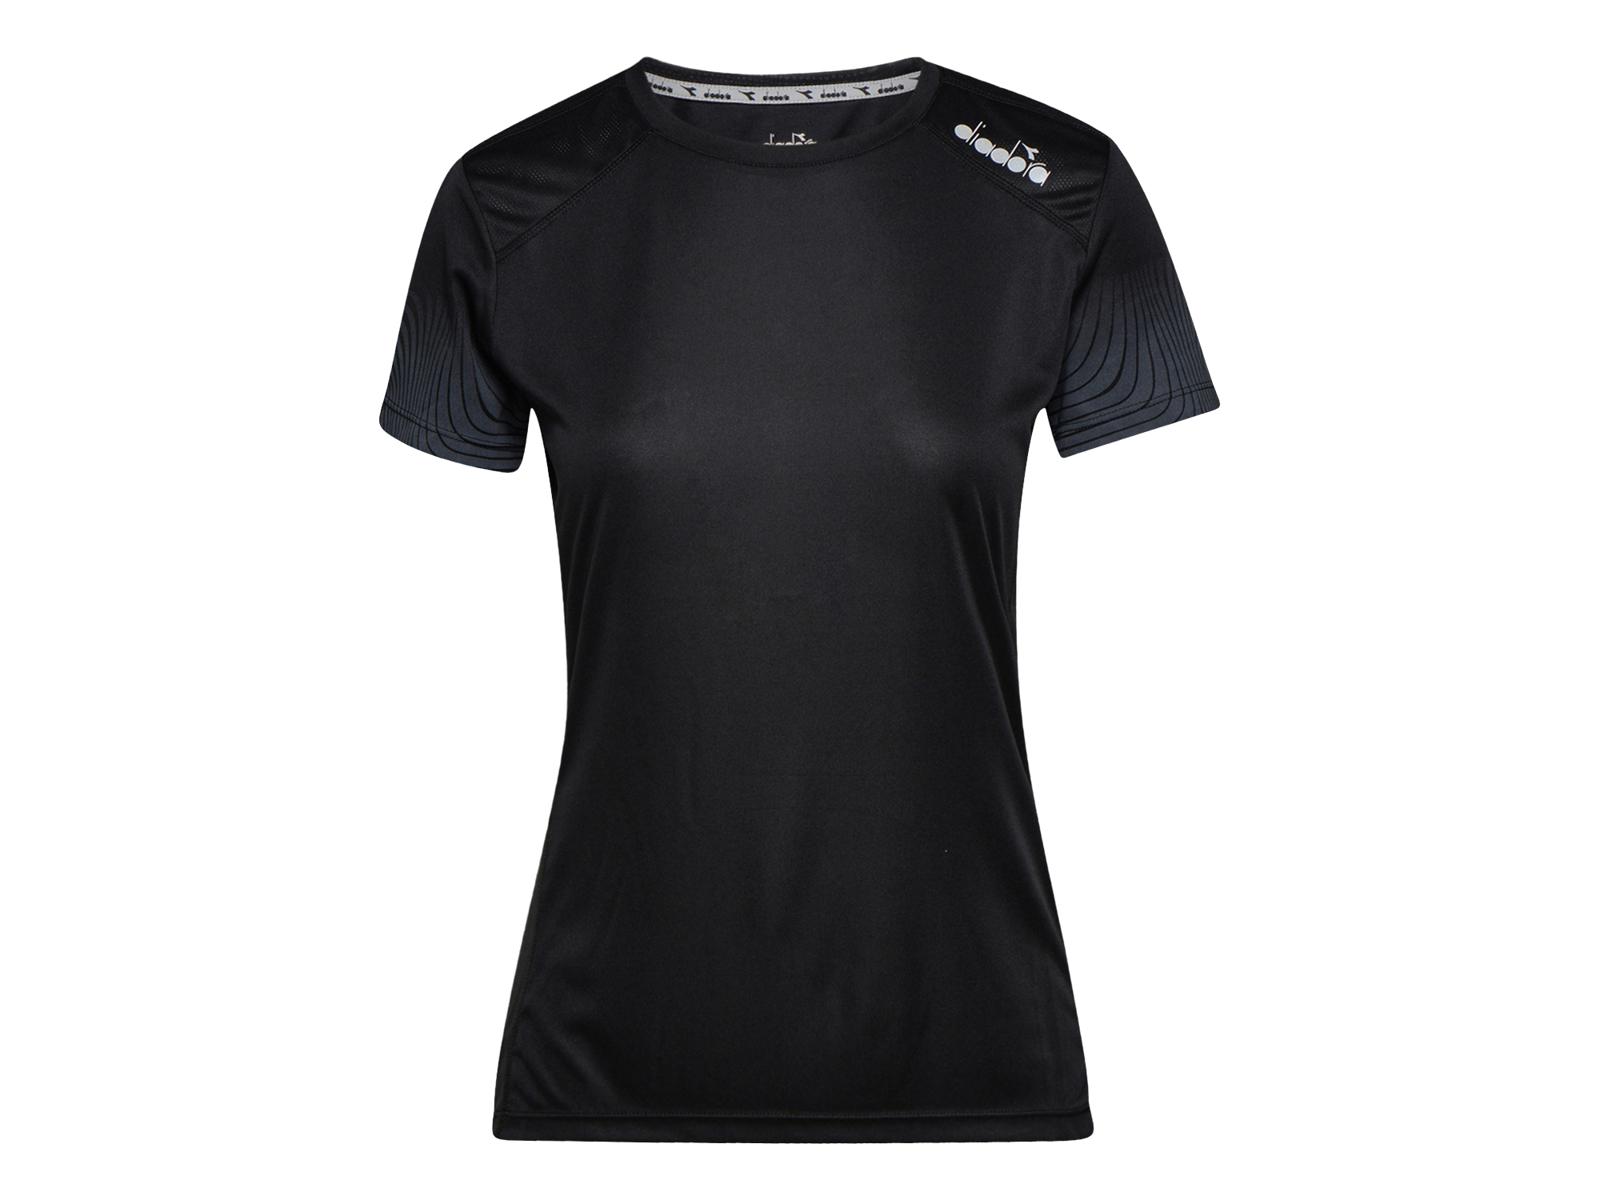 Diadora L. X Run SS T Shirt Løbe t shirt Dame Sort (DKK 51,60)